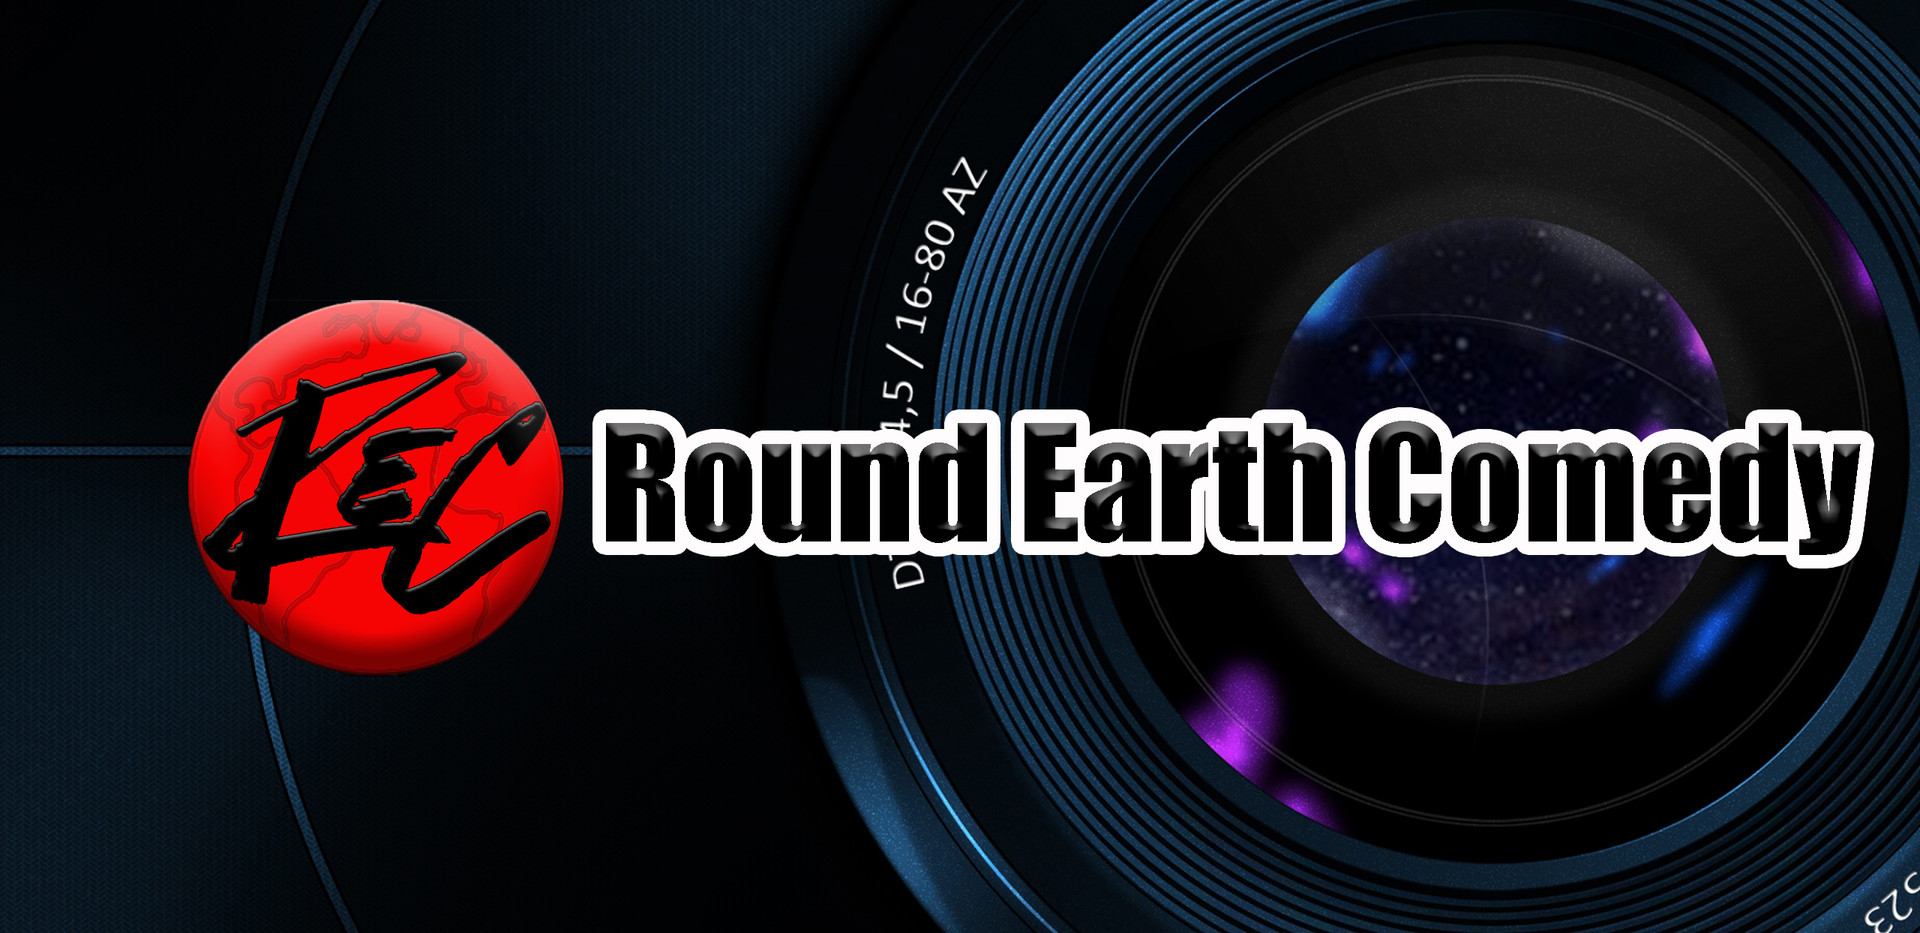 Round Earth Comedy